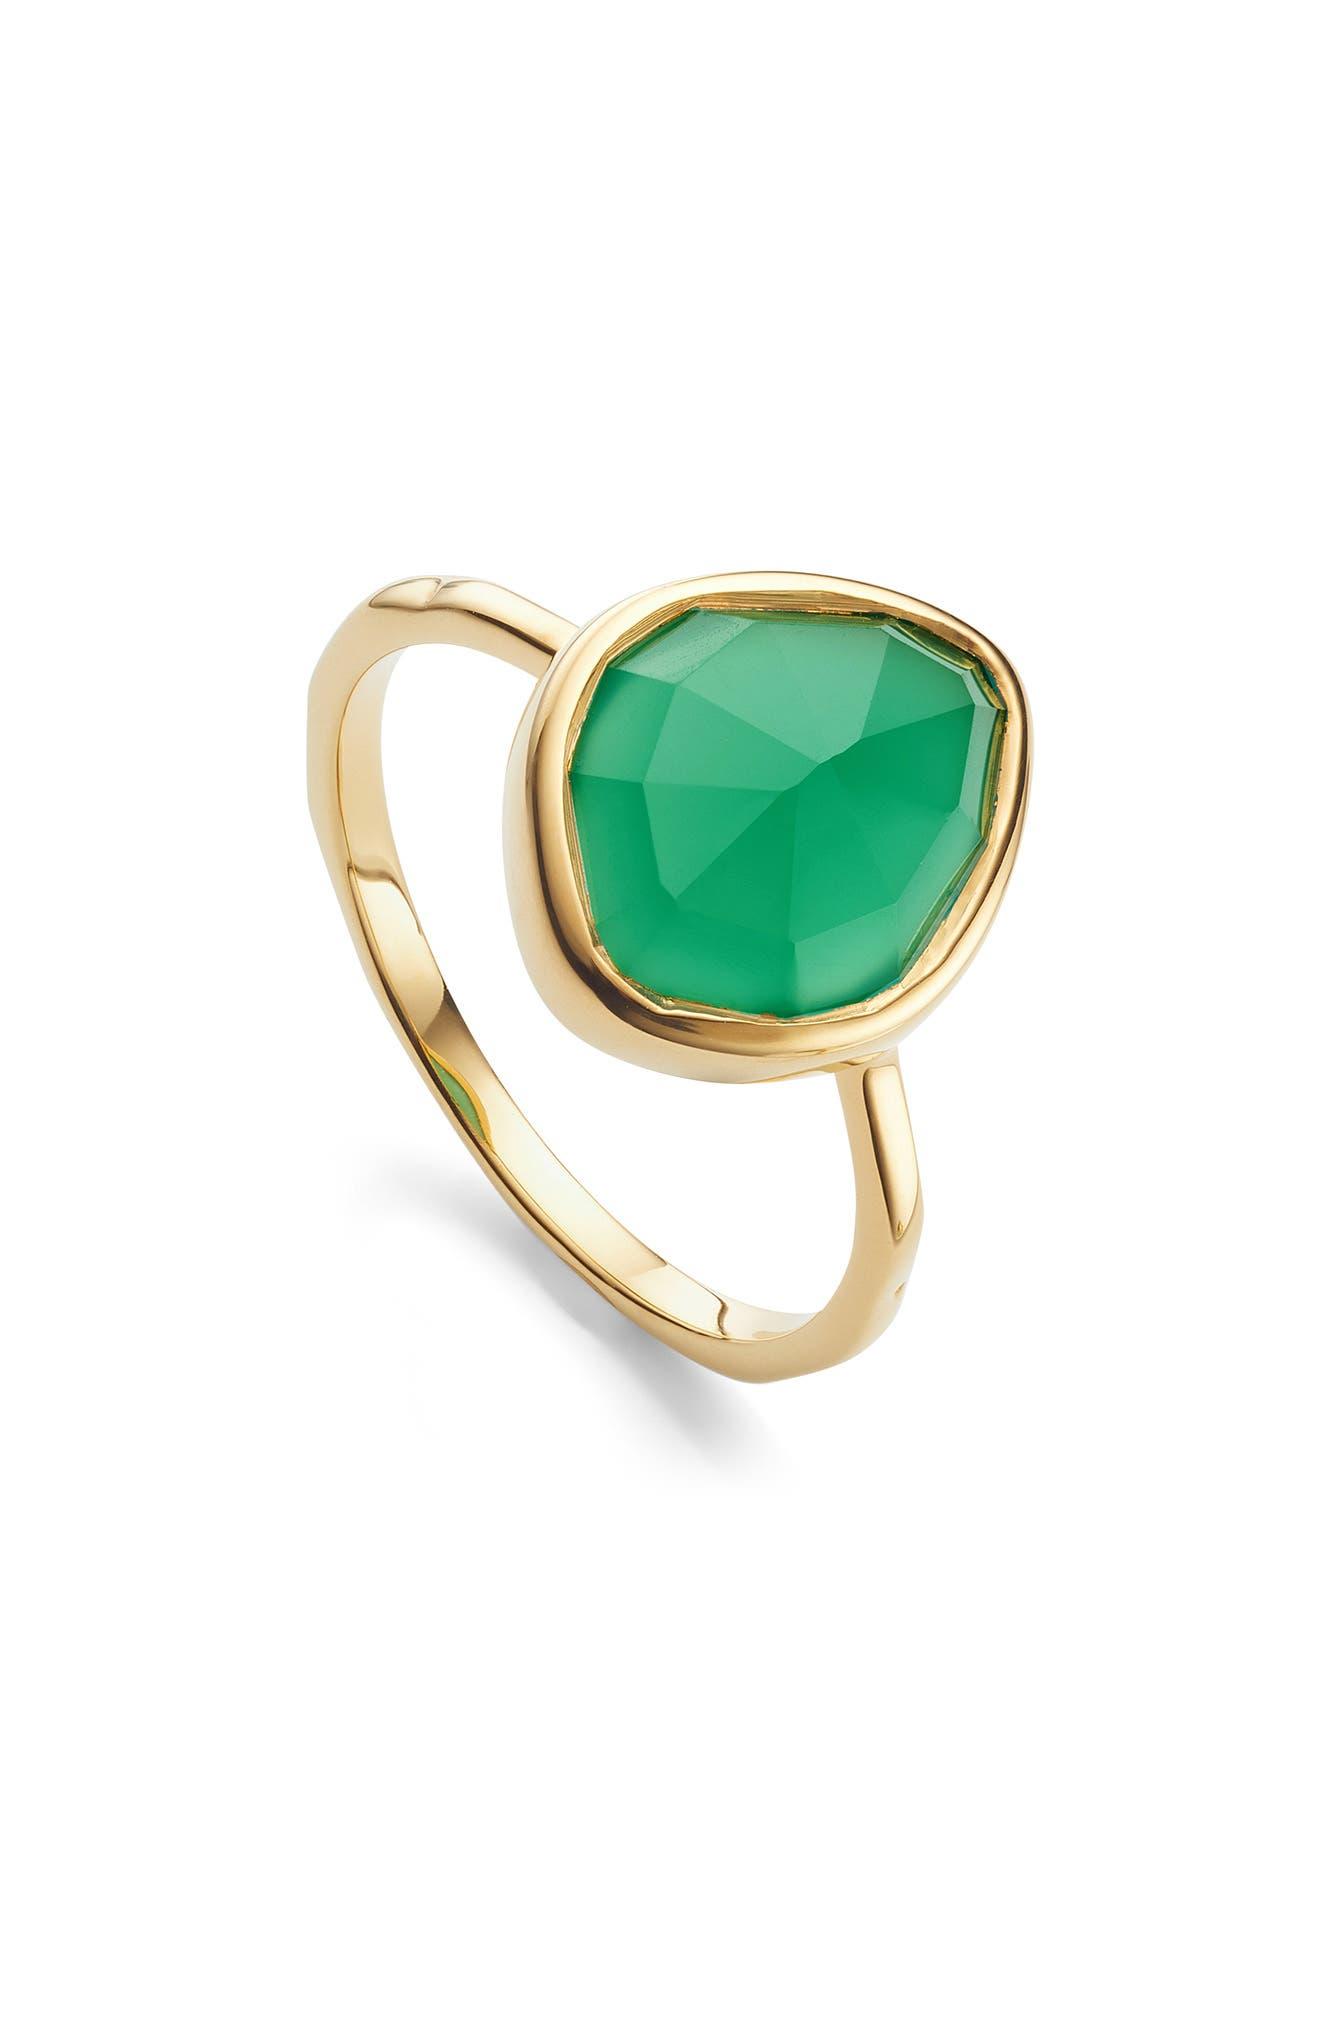 Siren Small Nugget Stacking Ring,                             Main thumbnail 1, color,                             Gold/ Green Onyx